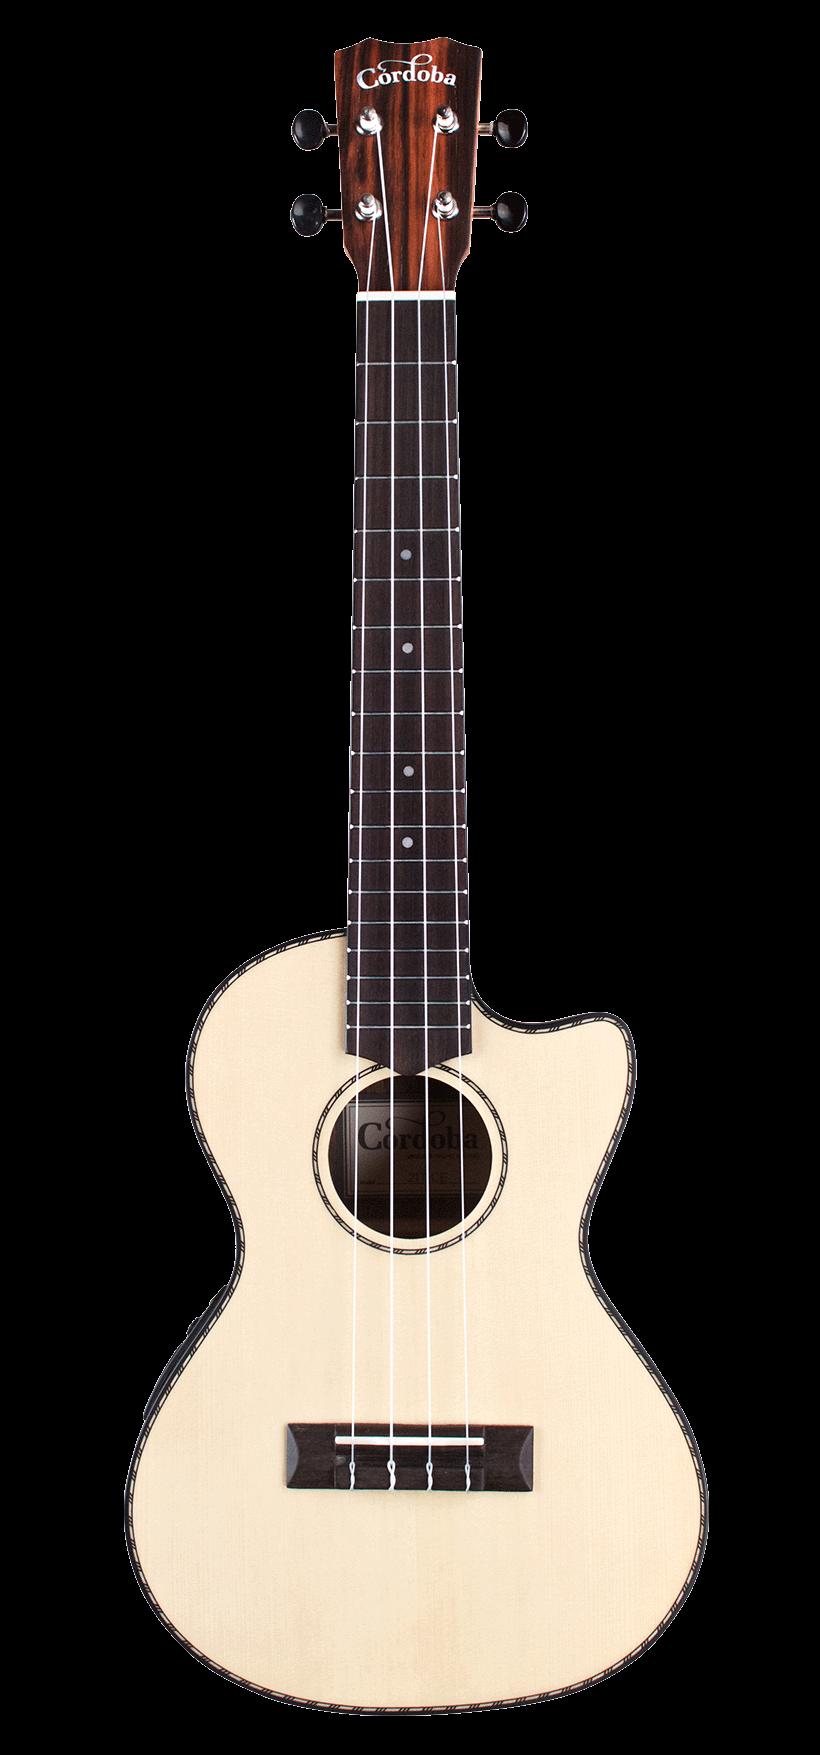 Cordoba 21T-CE Tenor Cutaway Acoustic Electric Ukulele 00249